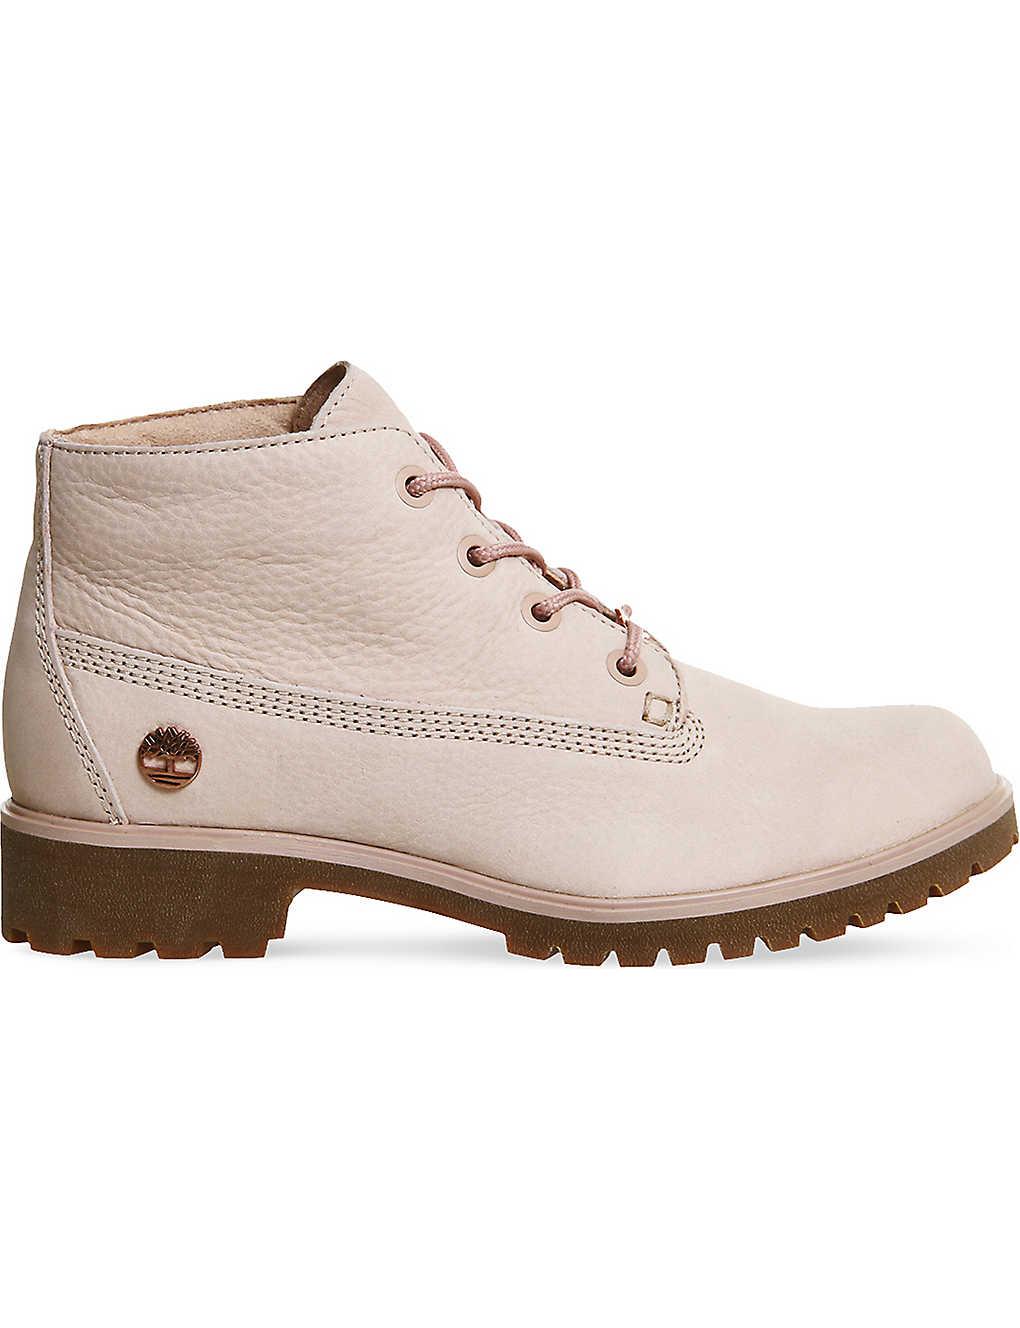 TIMBERLAND - Slim nellie nubuck leather chukka boots  b558d928eb3